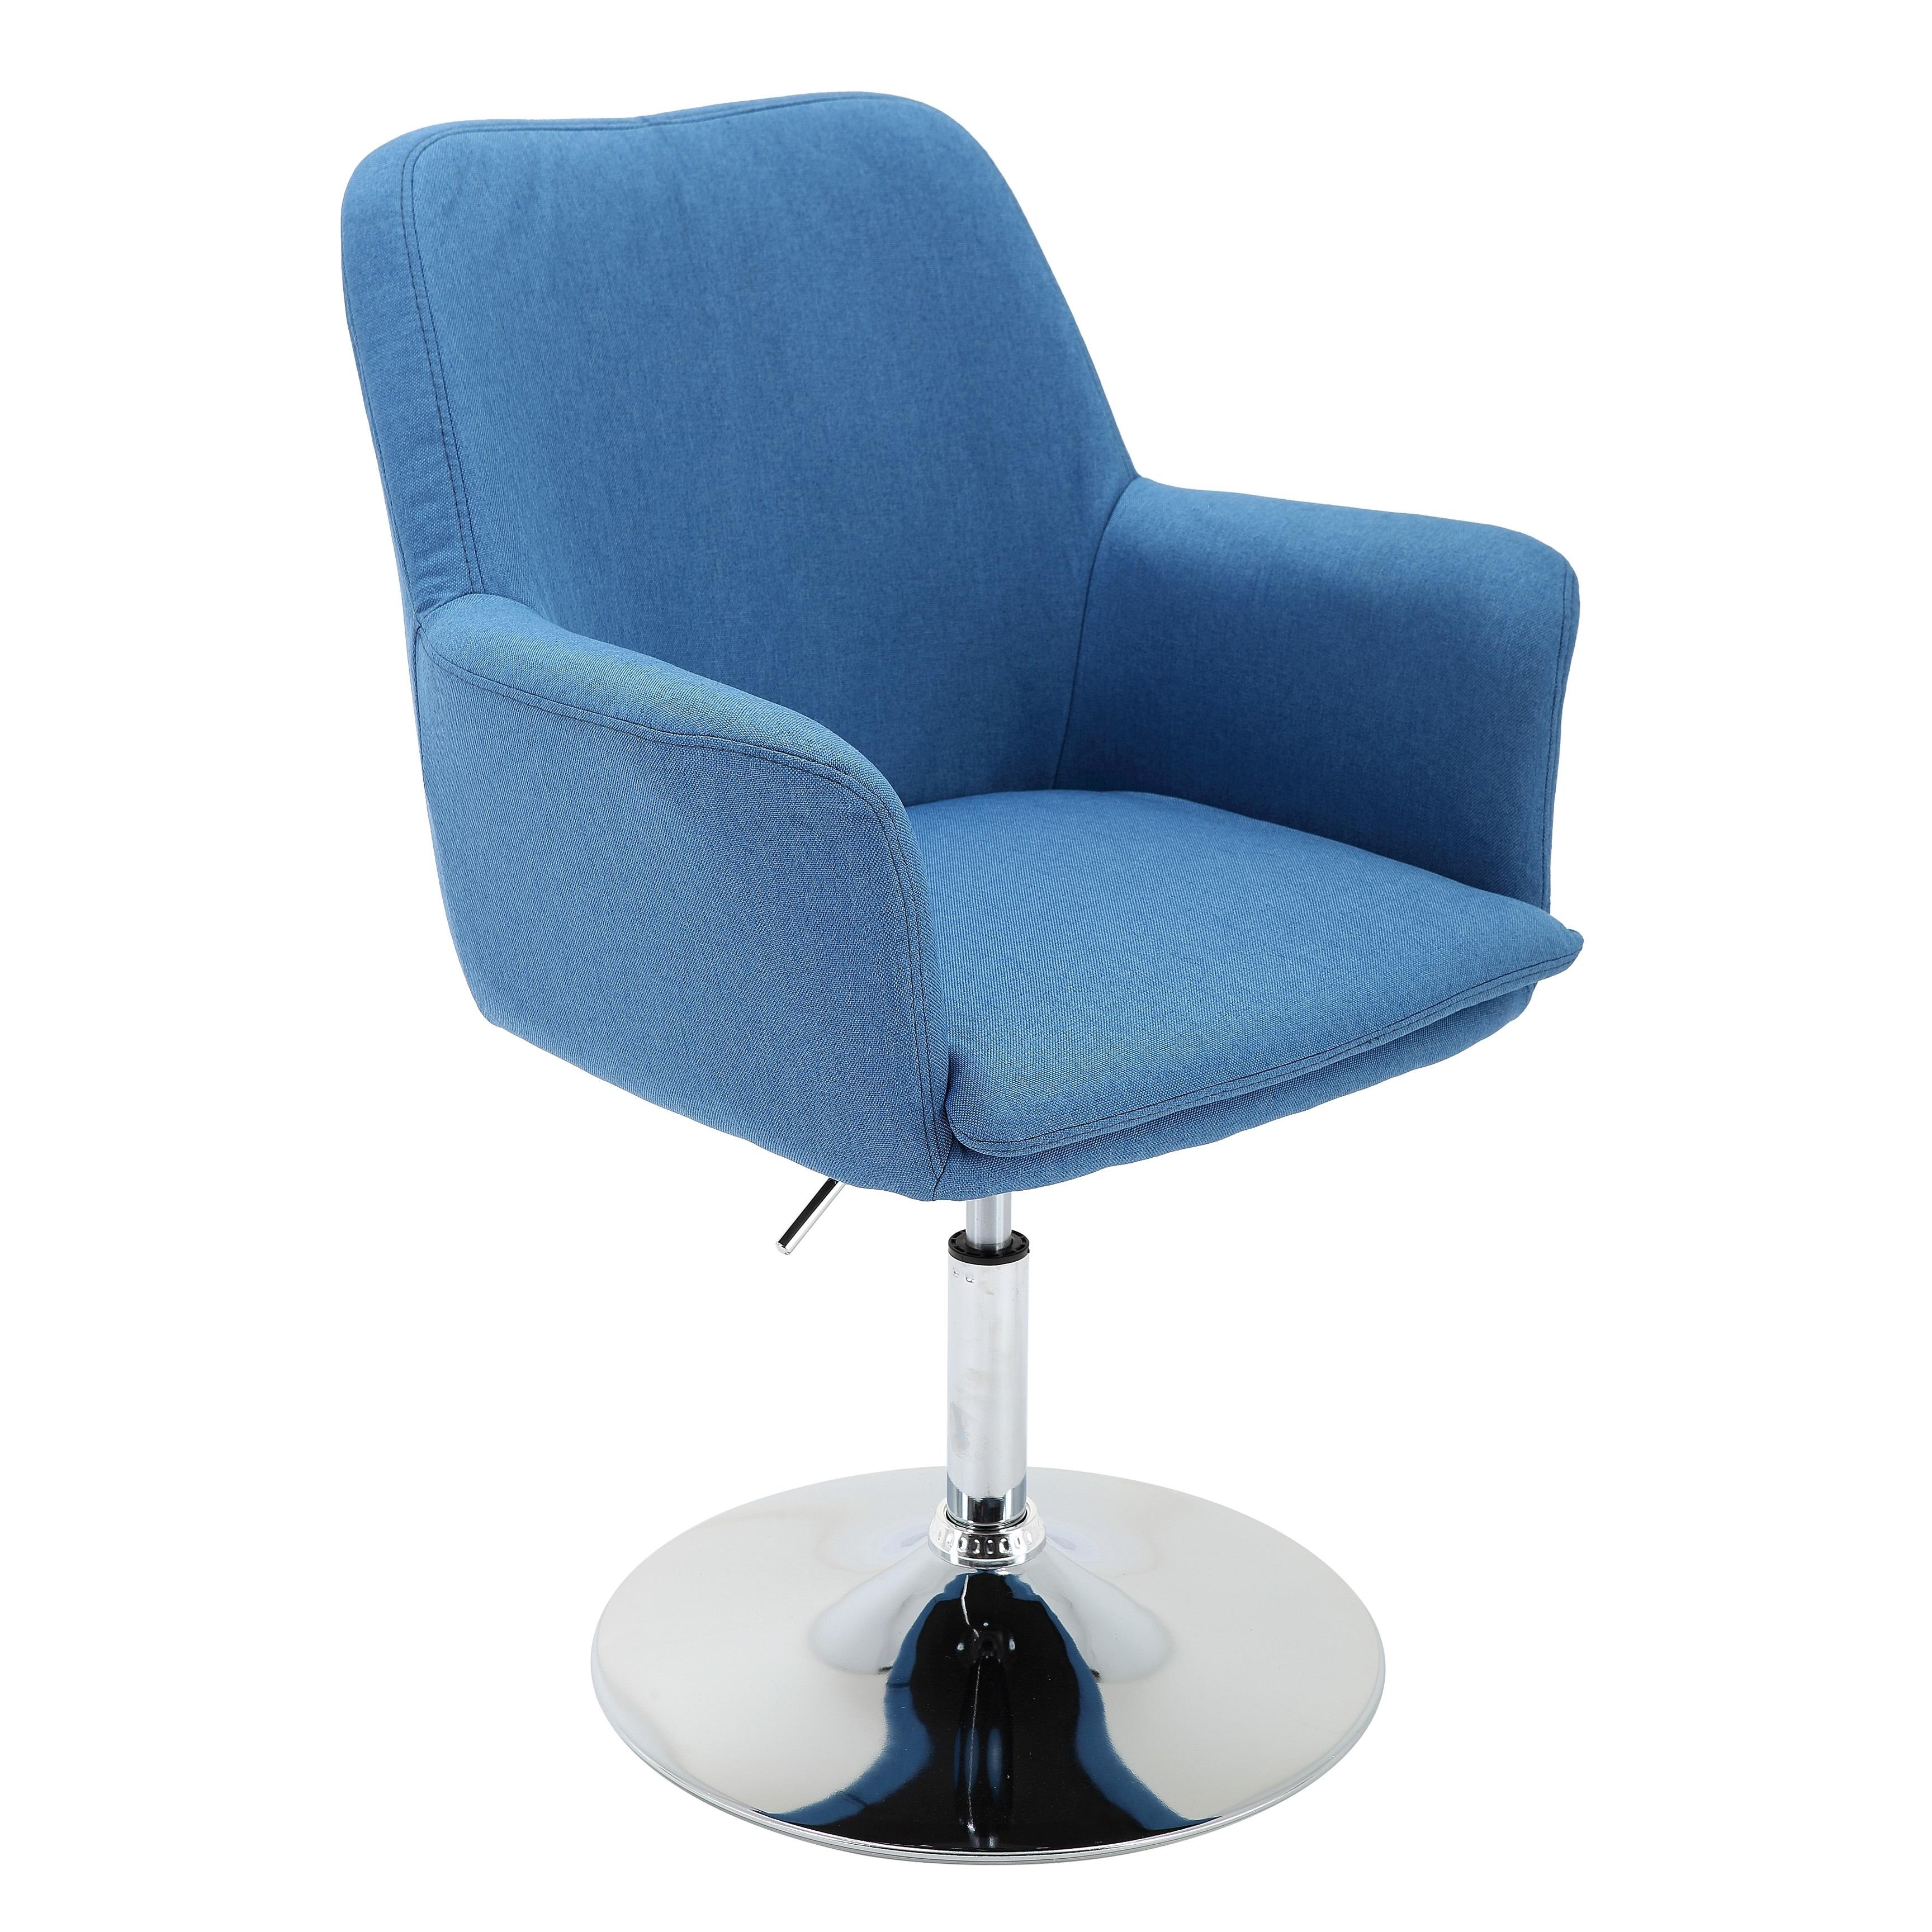 Porthos Home Fabric Pedestal Swivel Office Desk Chair